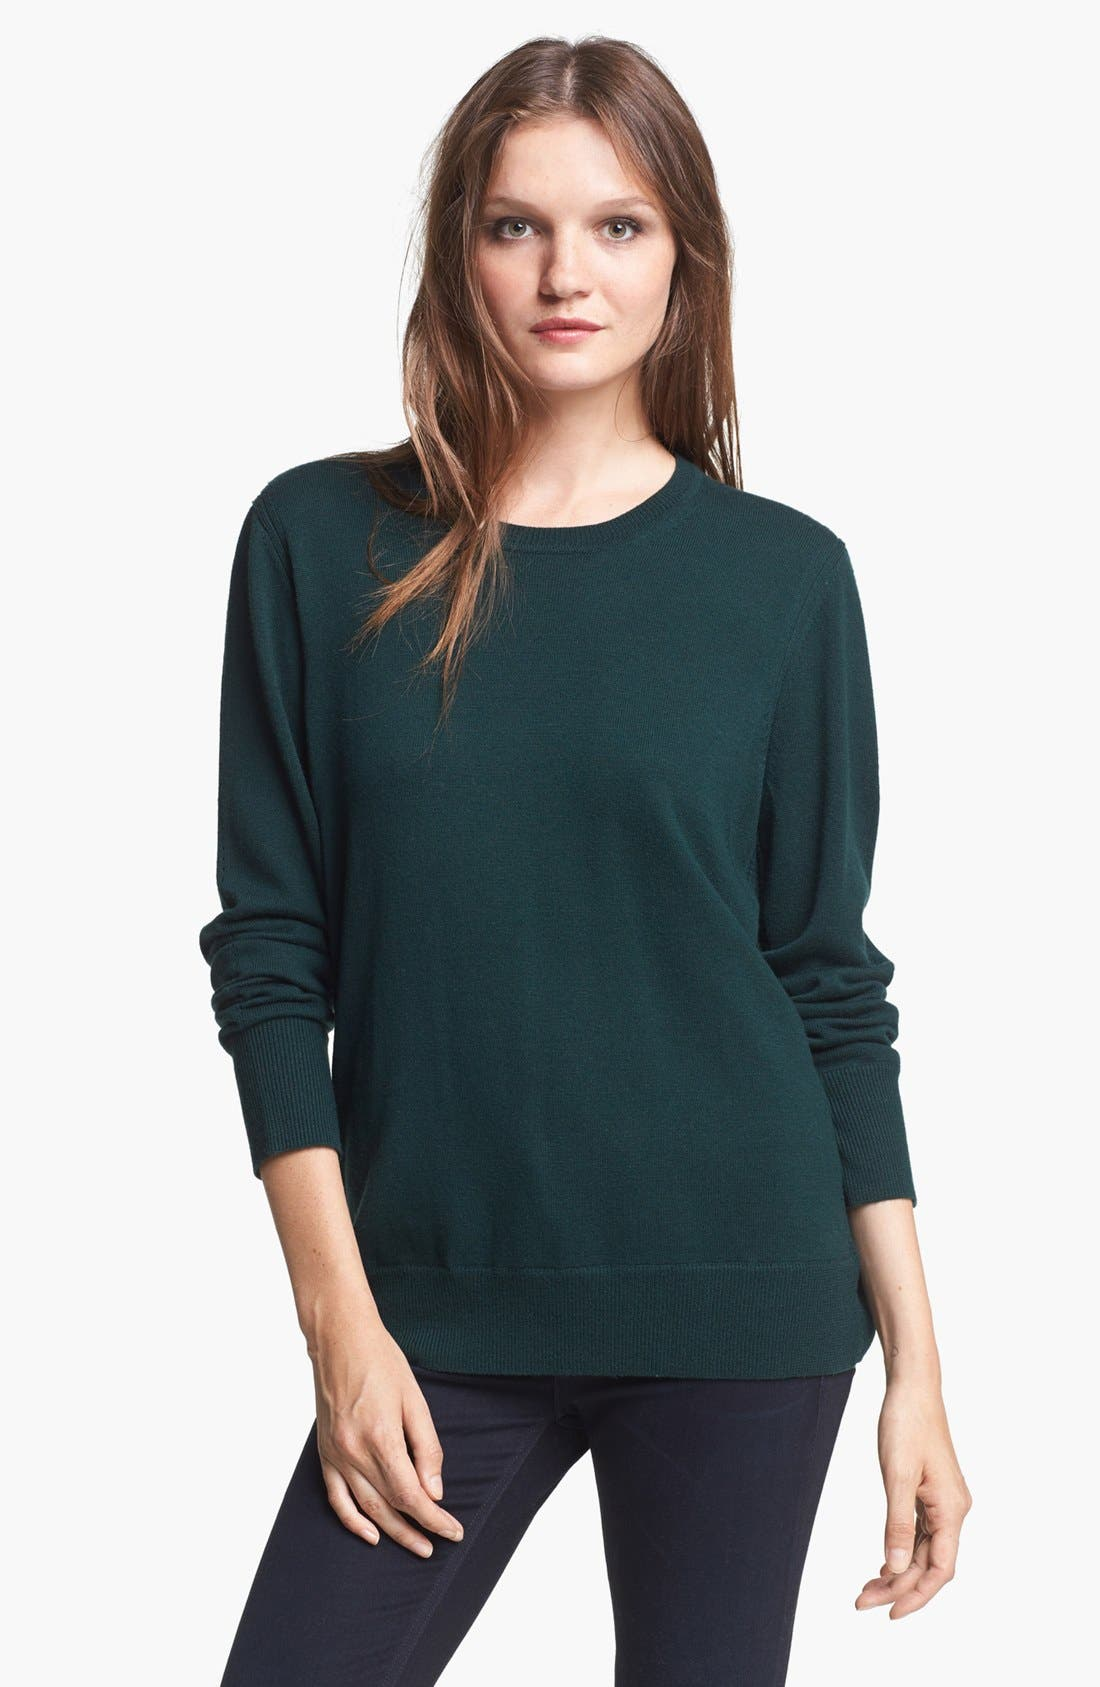 Alternate Image 1 Selected - rag & bone/JEAN 'Natalie' Merino Wool Sweater